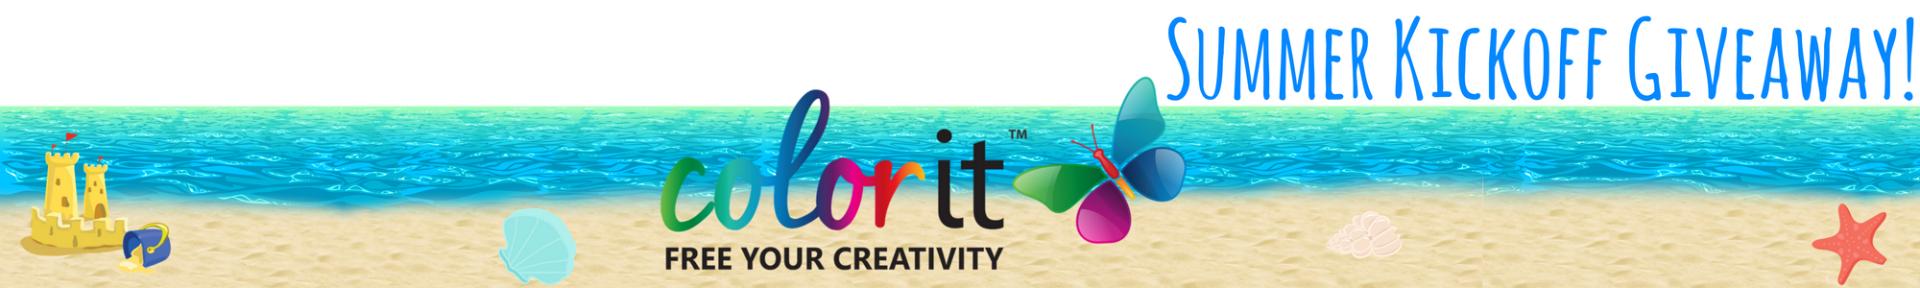 www.colorit.com/summer